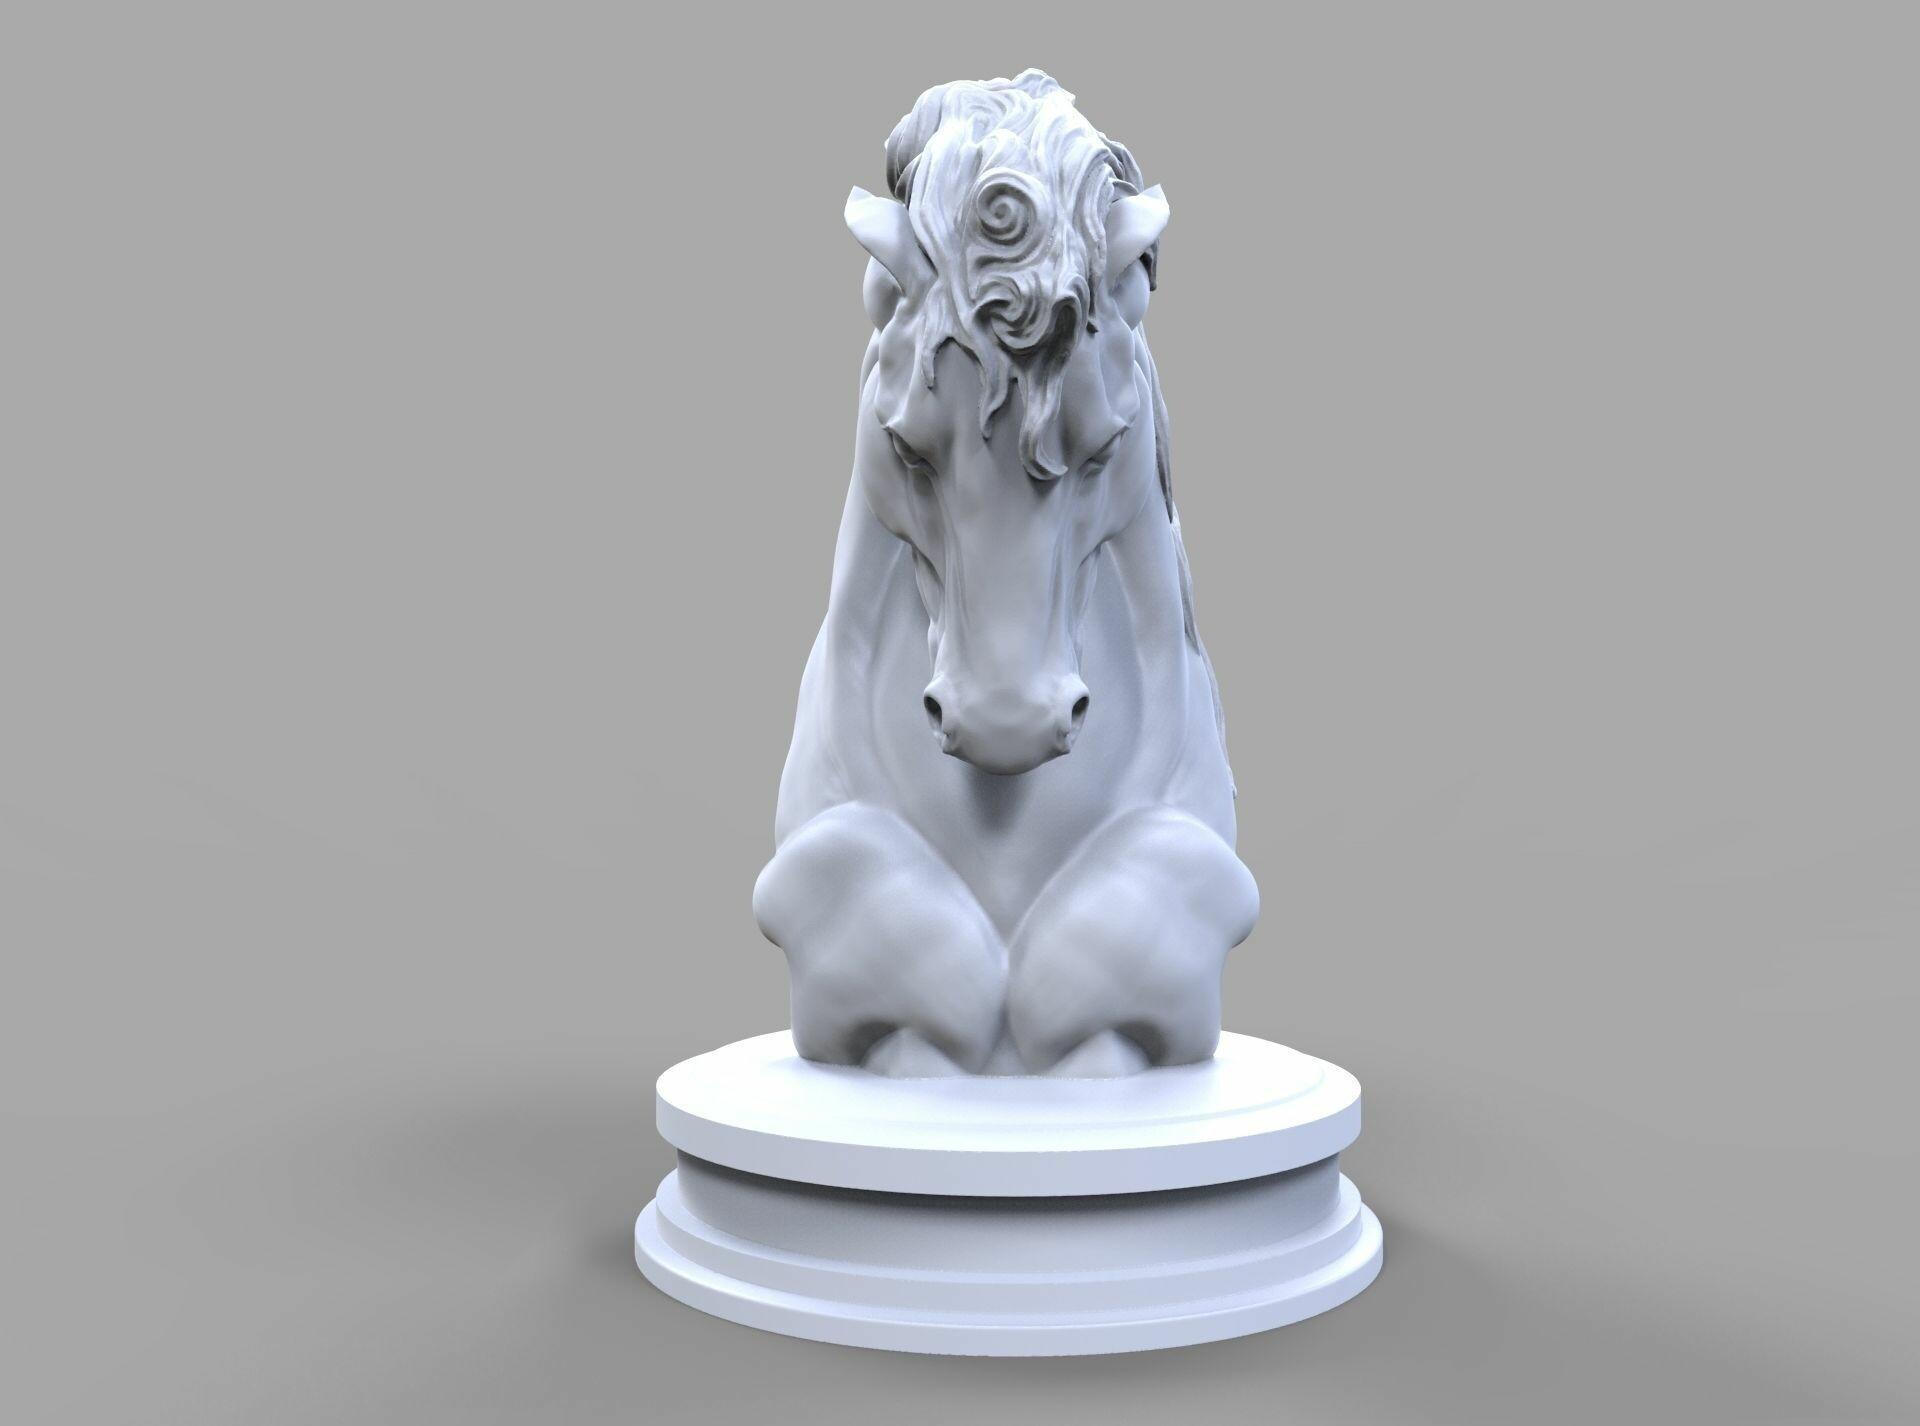 Georg povolyaev torso of a horse 3d model obj mtl fbx stl blend dae 1